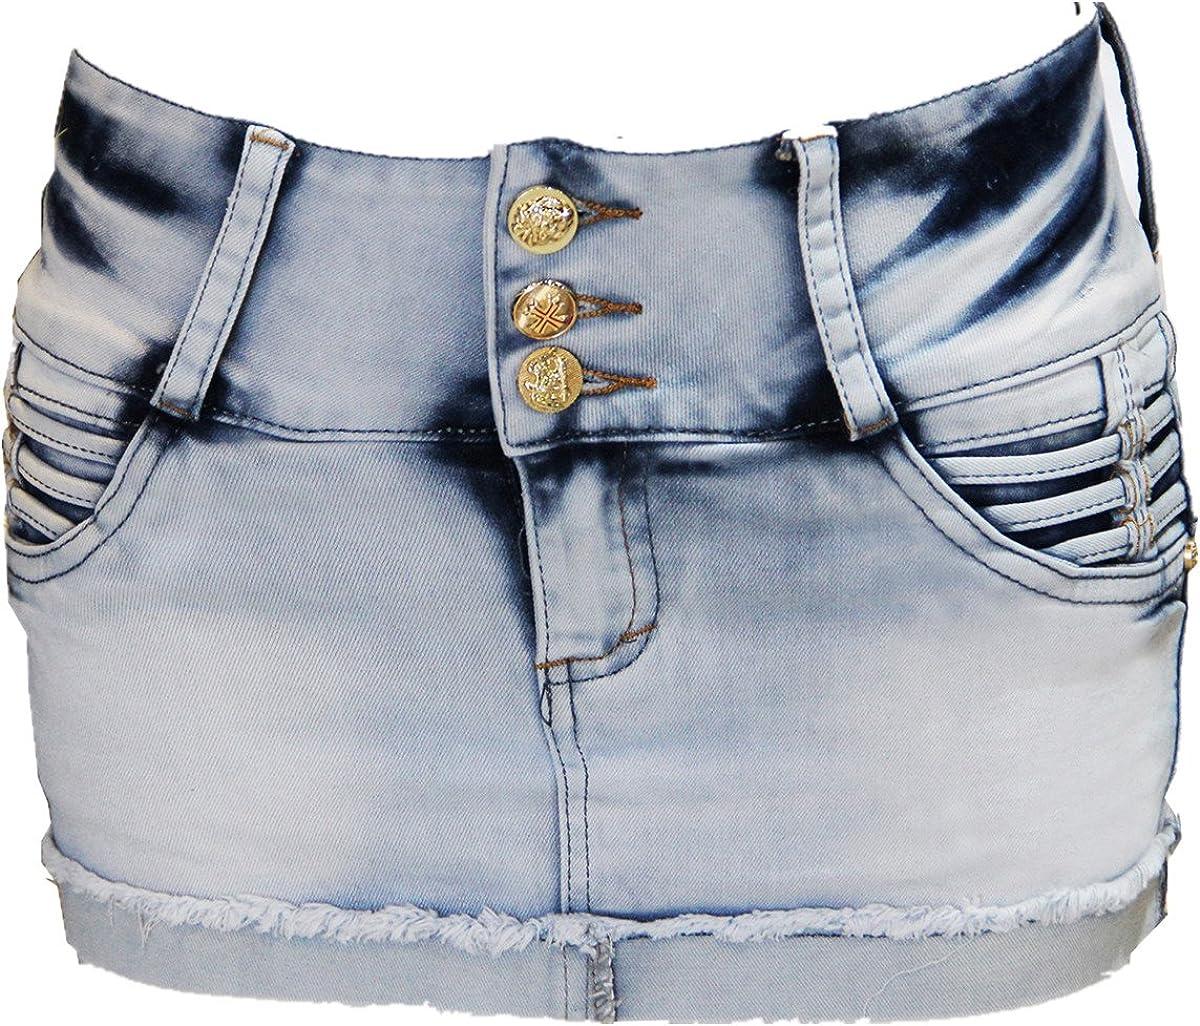 FARINA® 1689 Vaquero Mini Falda, Jeans Faldas, Faldas Cortas para ...